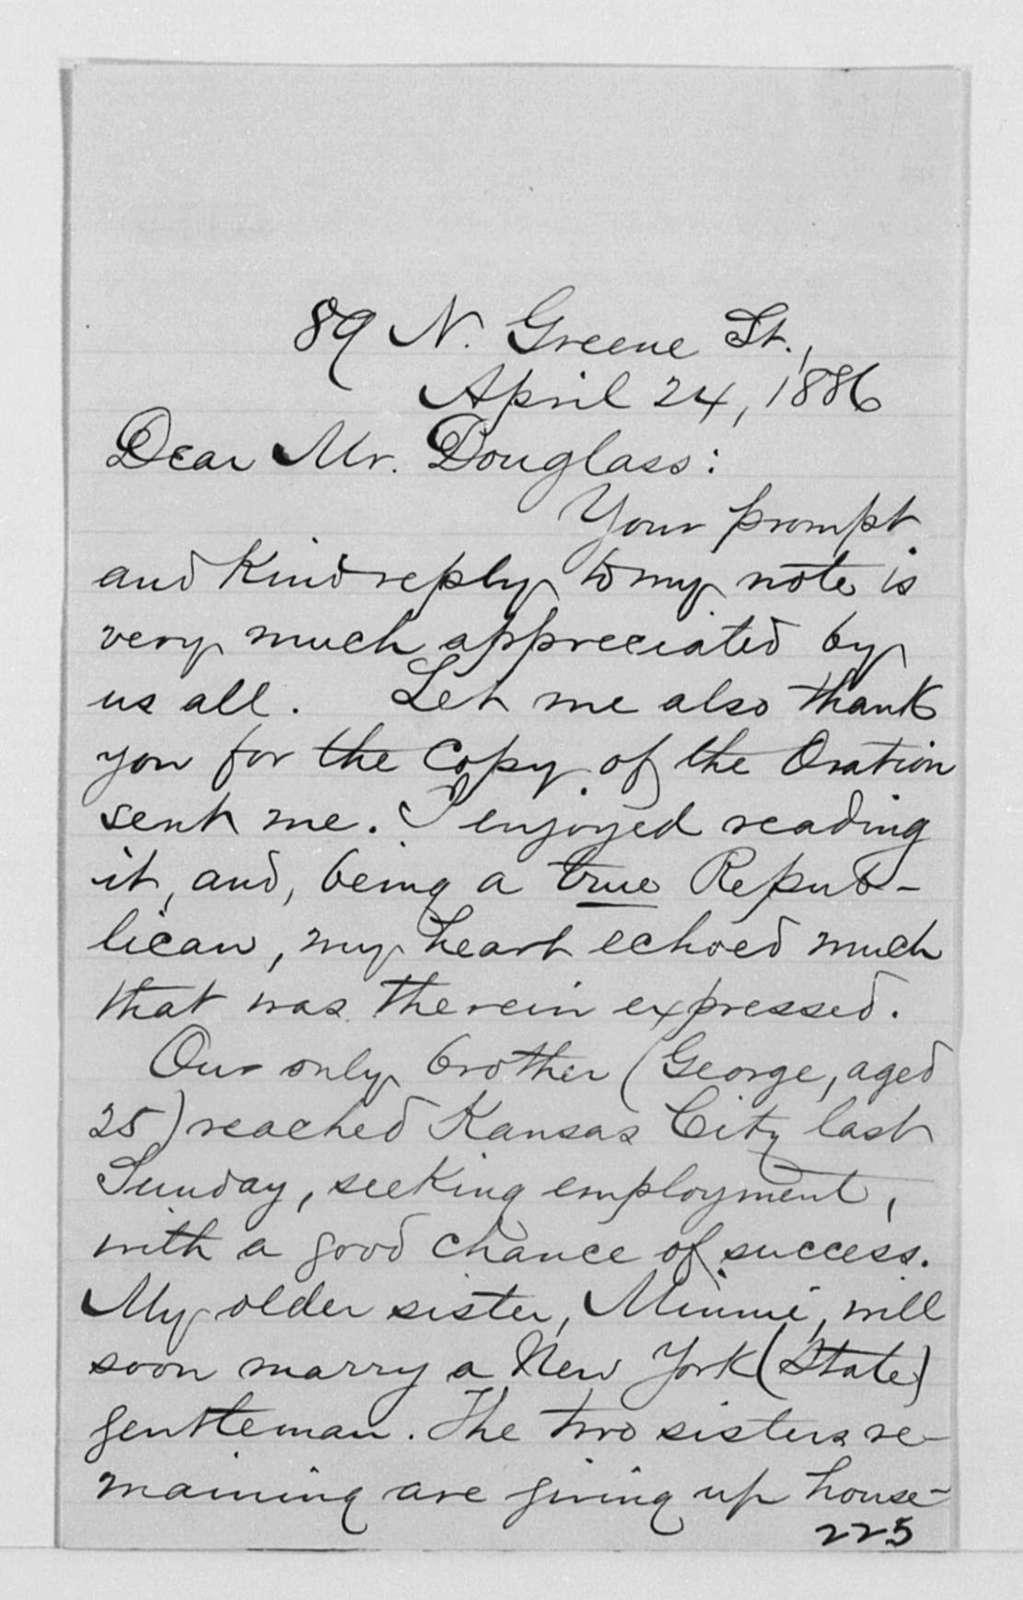 1886, Apr. - May